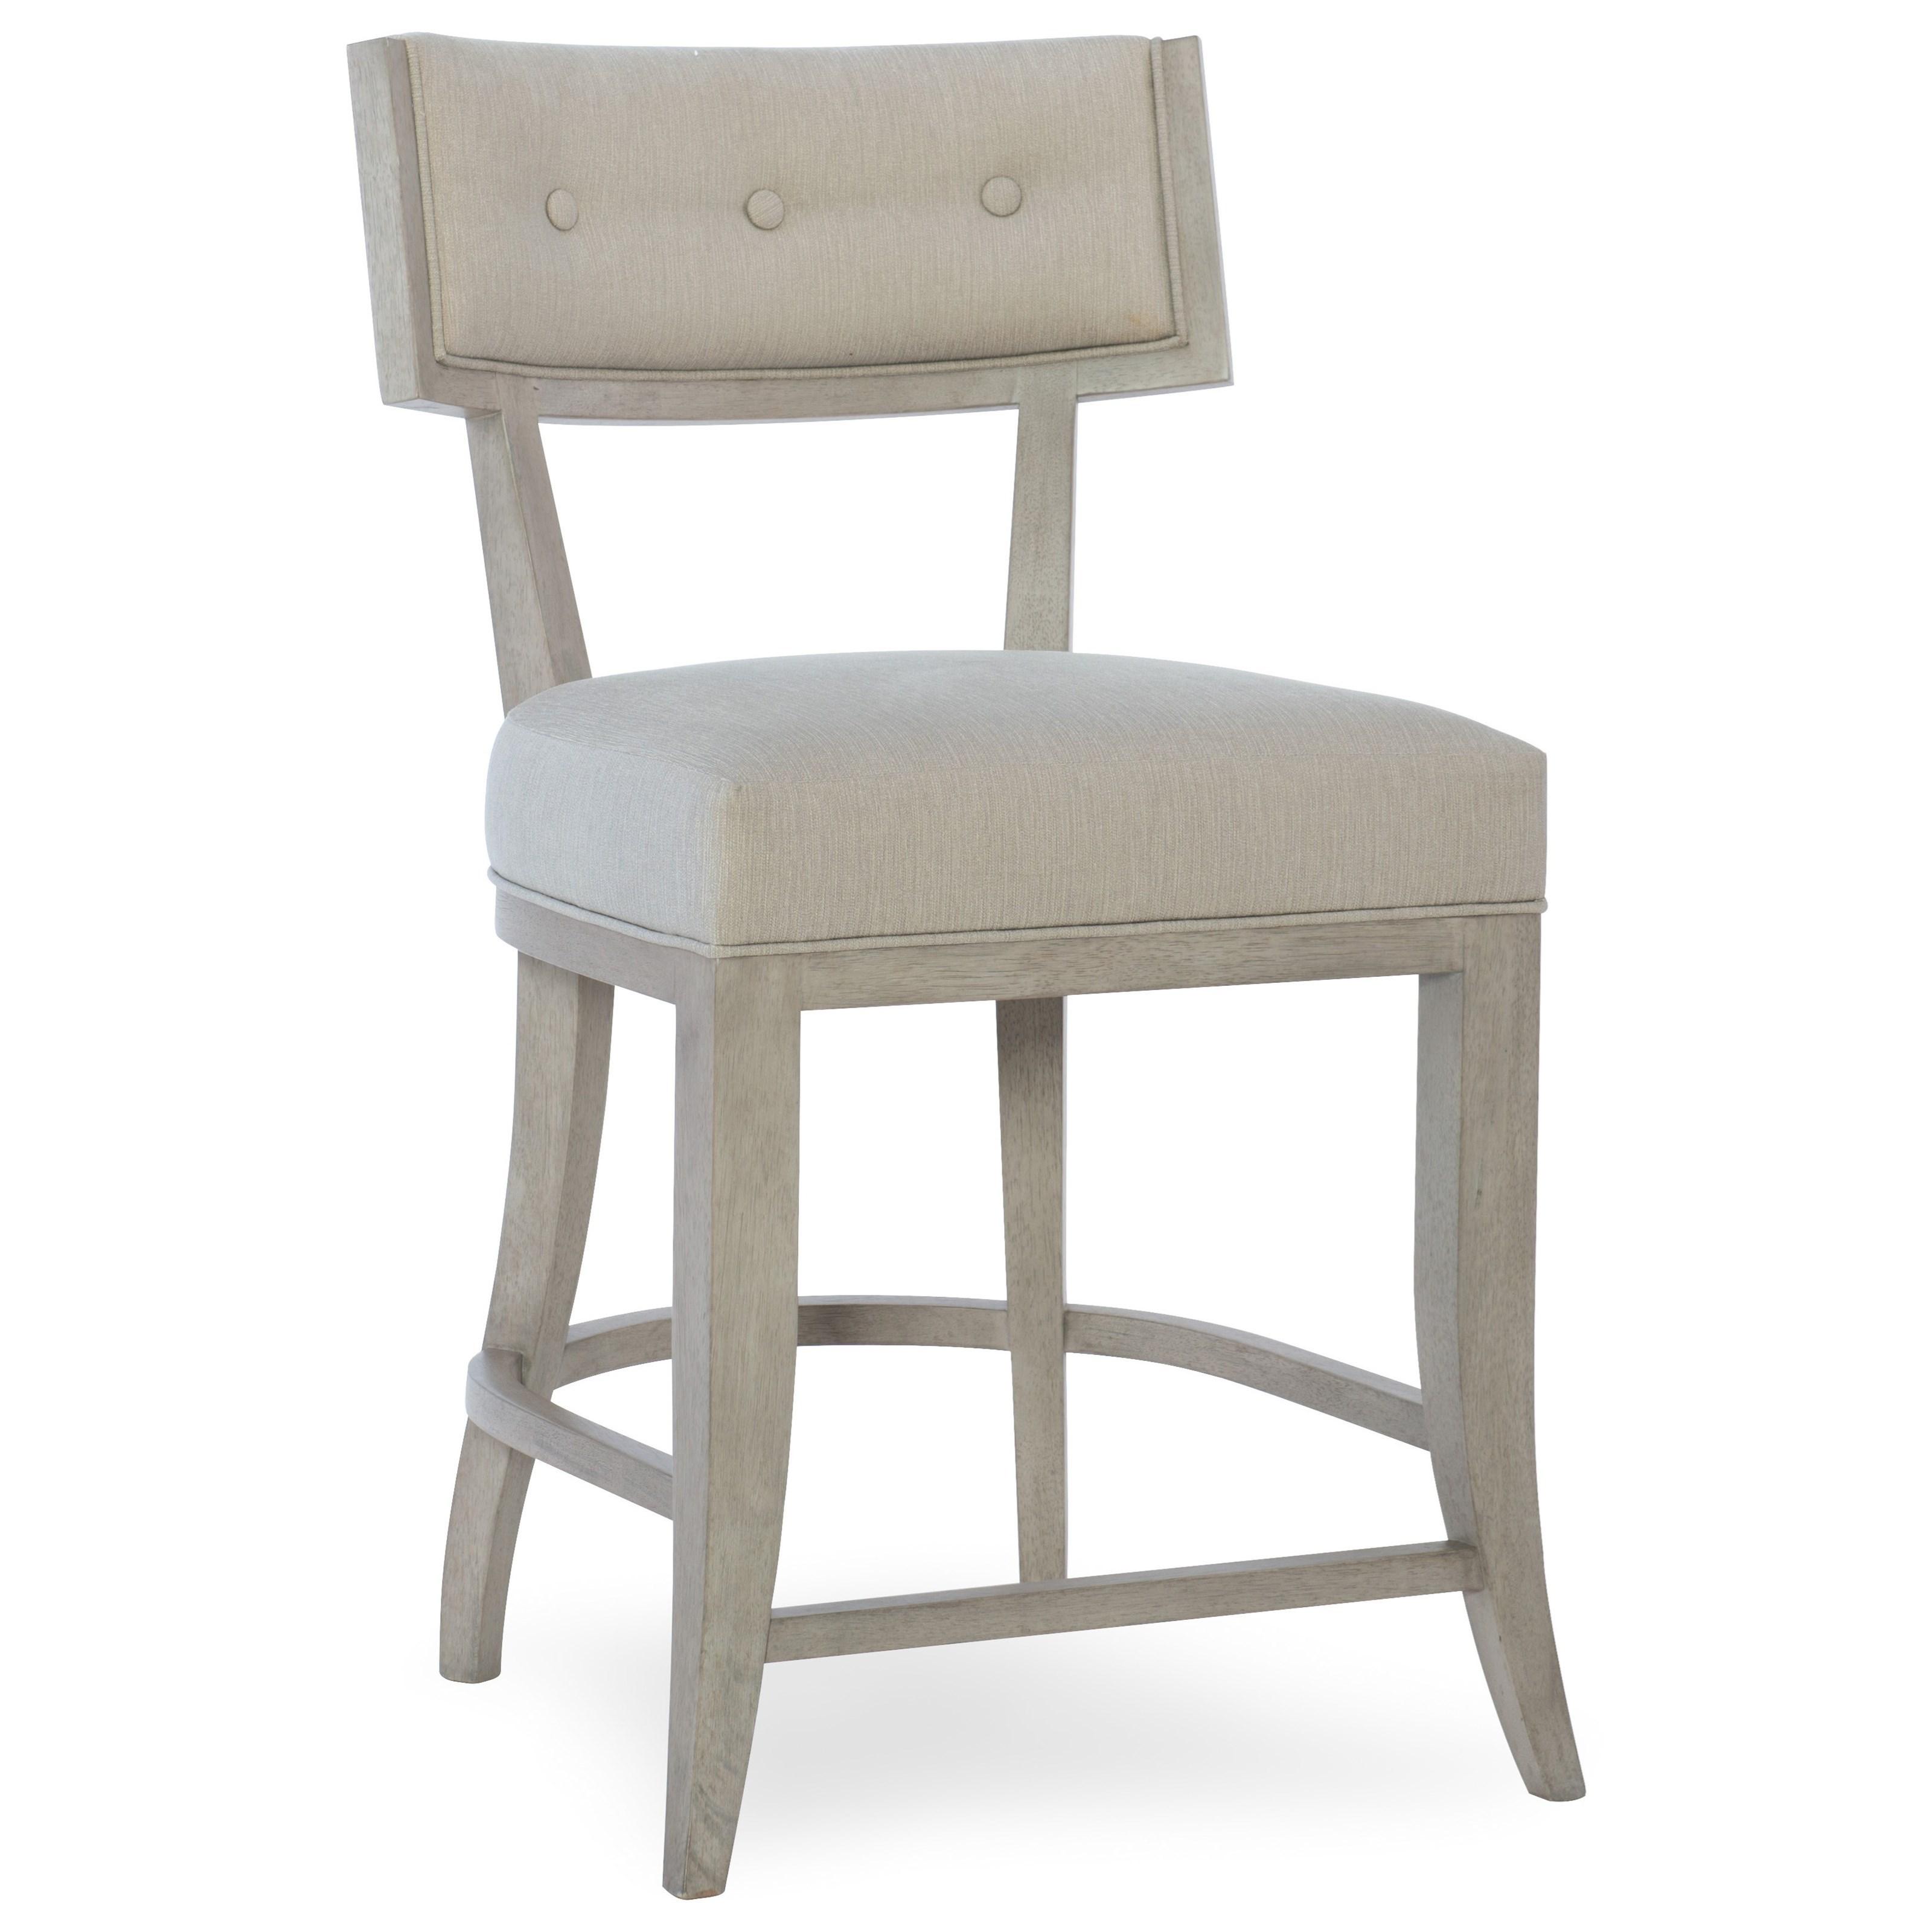 Elixir Klismos Counter Stool by Hooker Furniture at Miller Waldrop Furniture and Decor